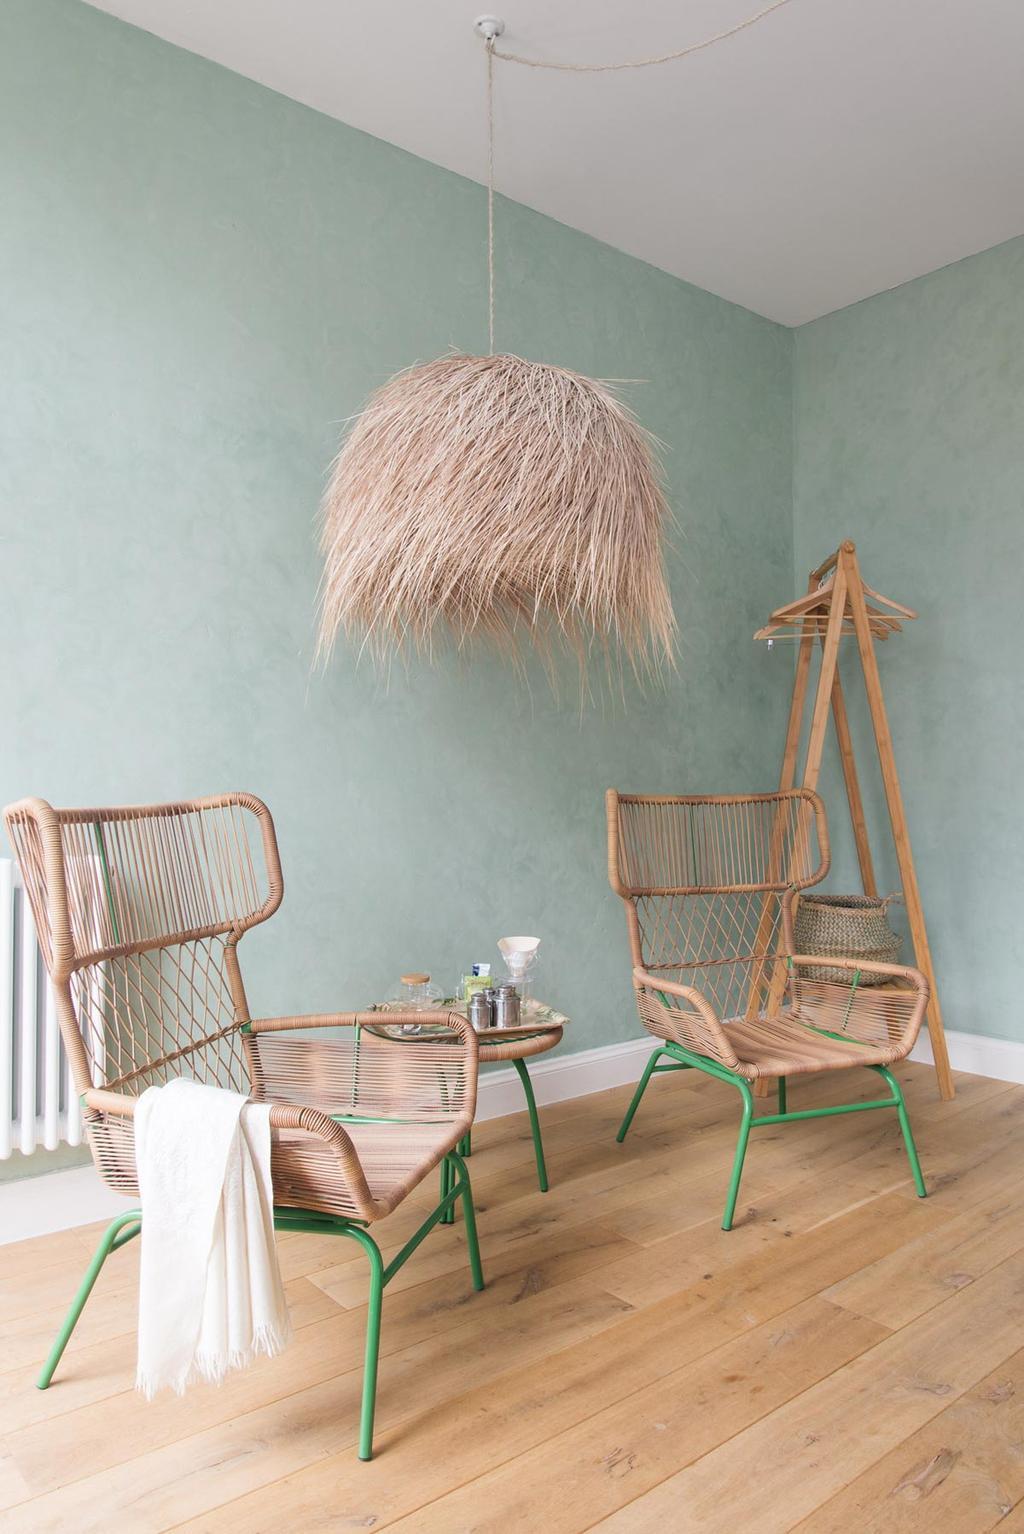 De Nature kamer met rieten meubels en groene muur in B&B The Doghouse in Brugge